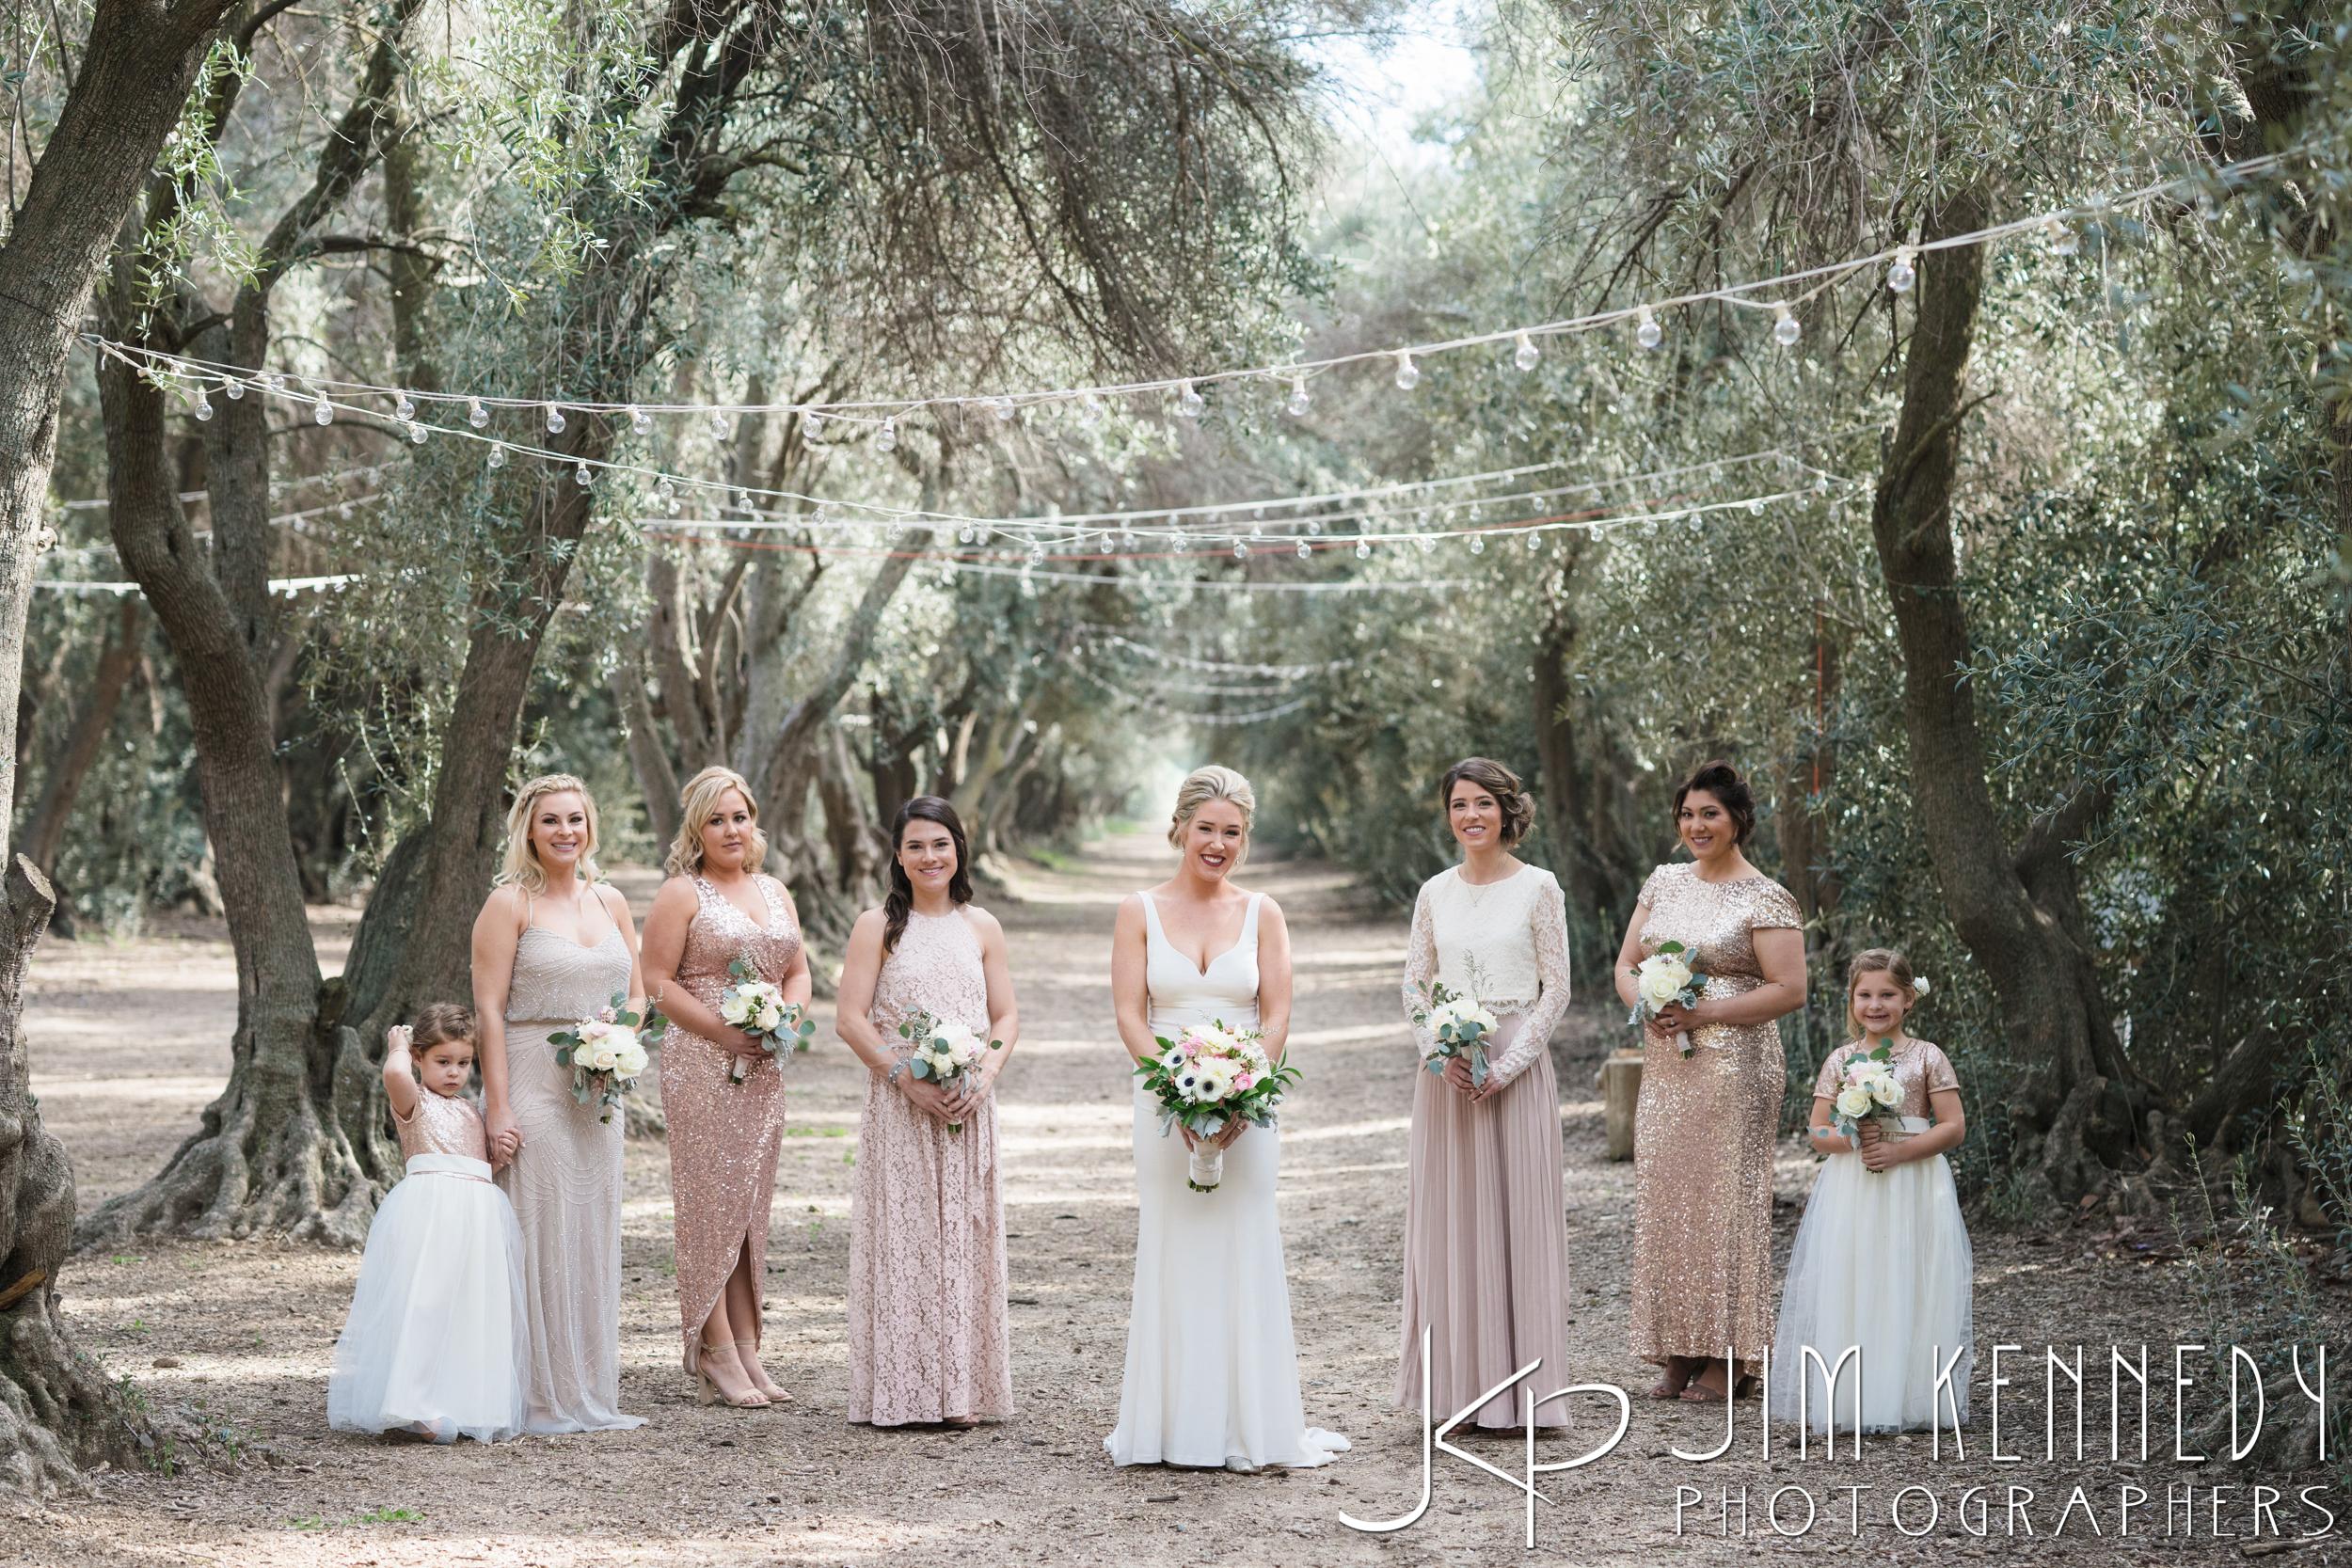 jim_kennedy_photographers_highland_springs_wedding_caitlyn_0059.jpg